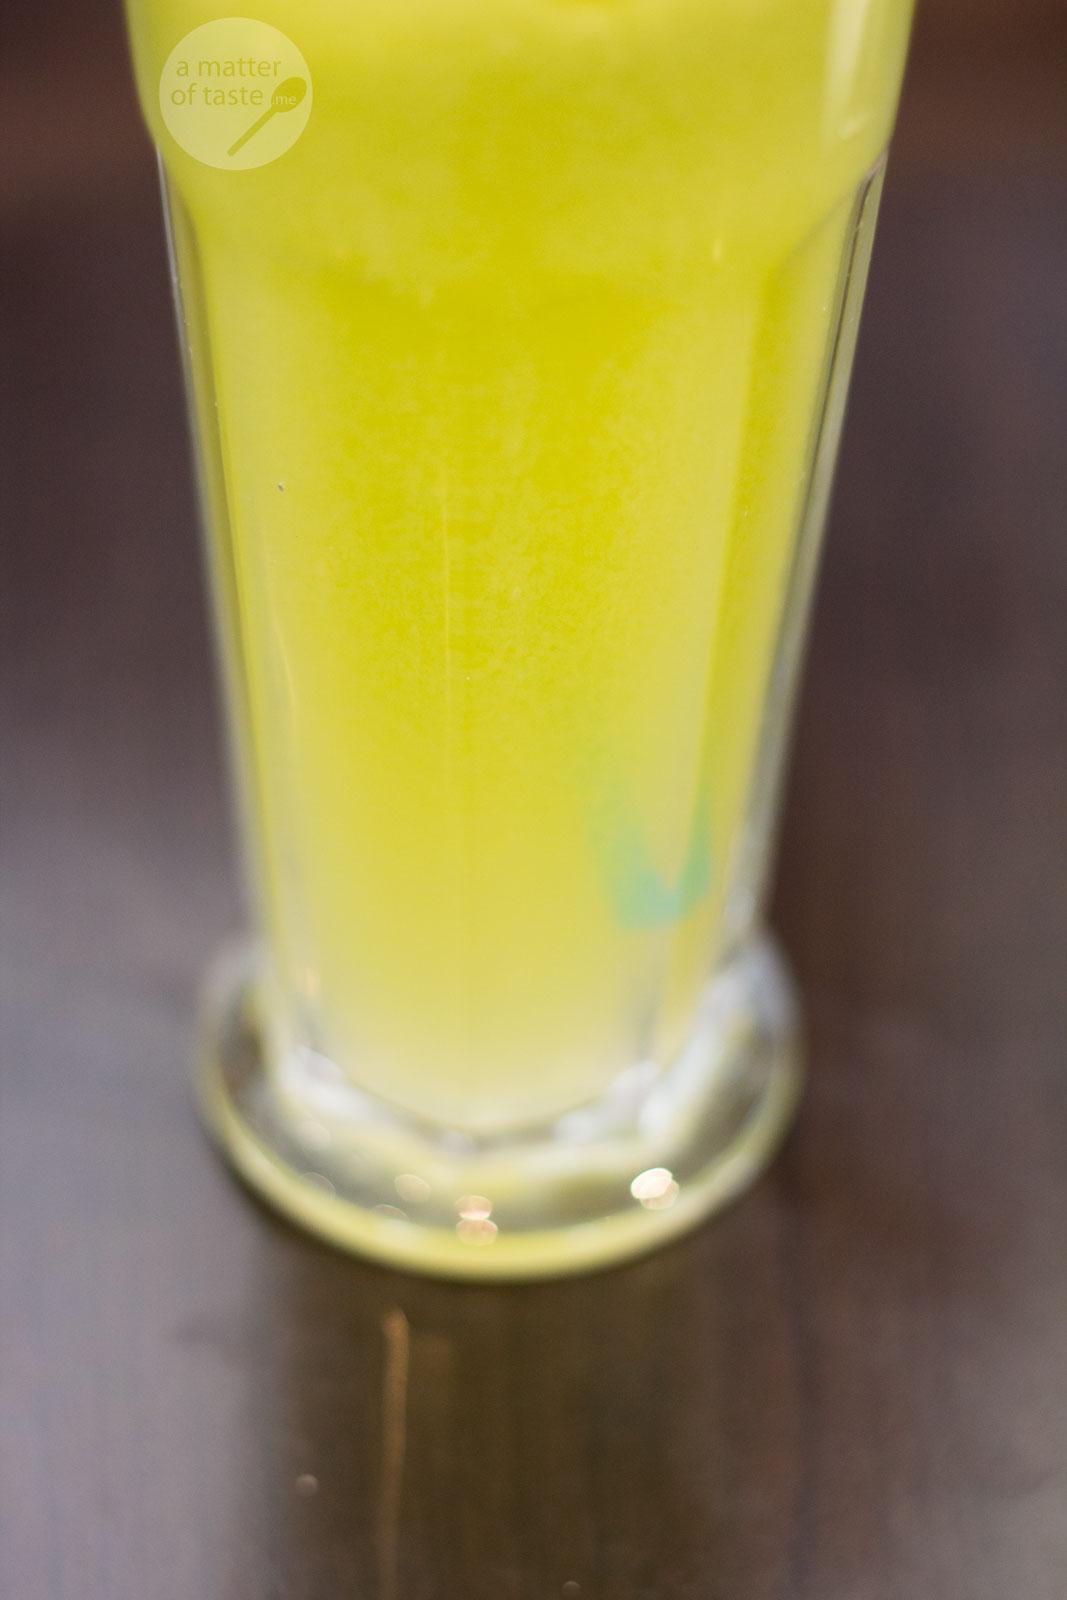 Double Shot New Farm apple juice